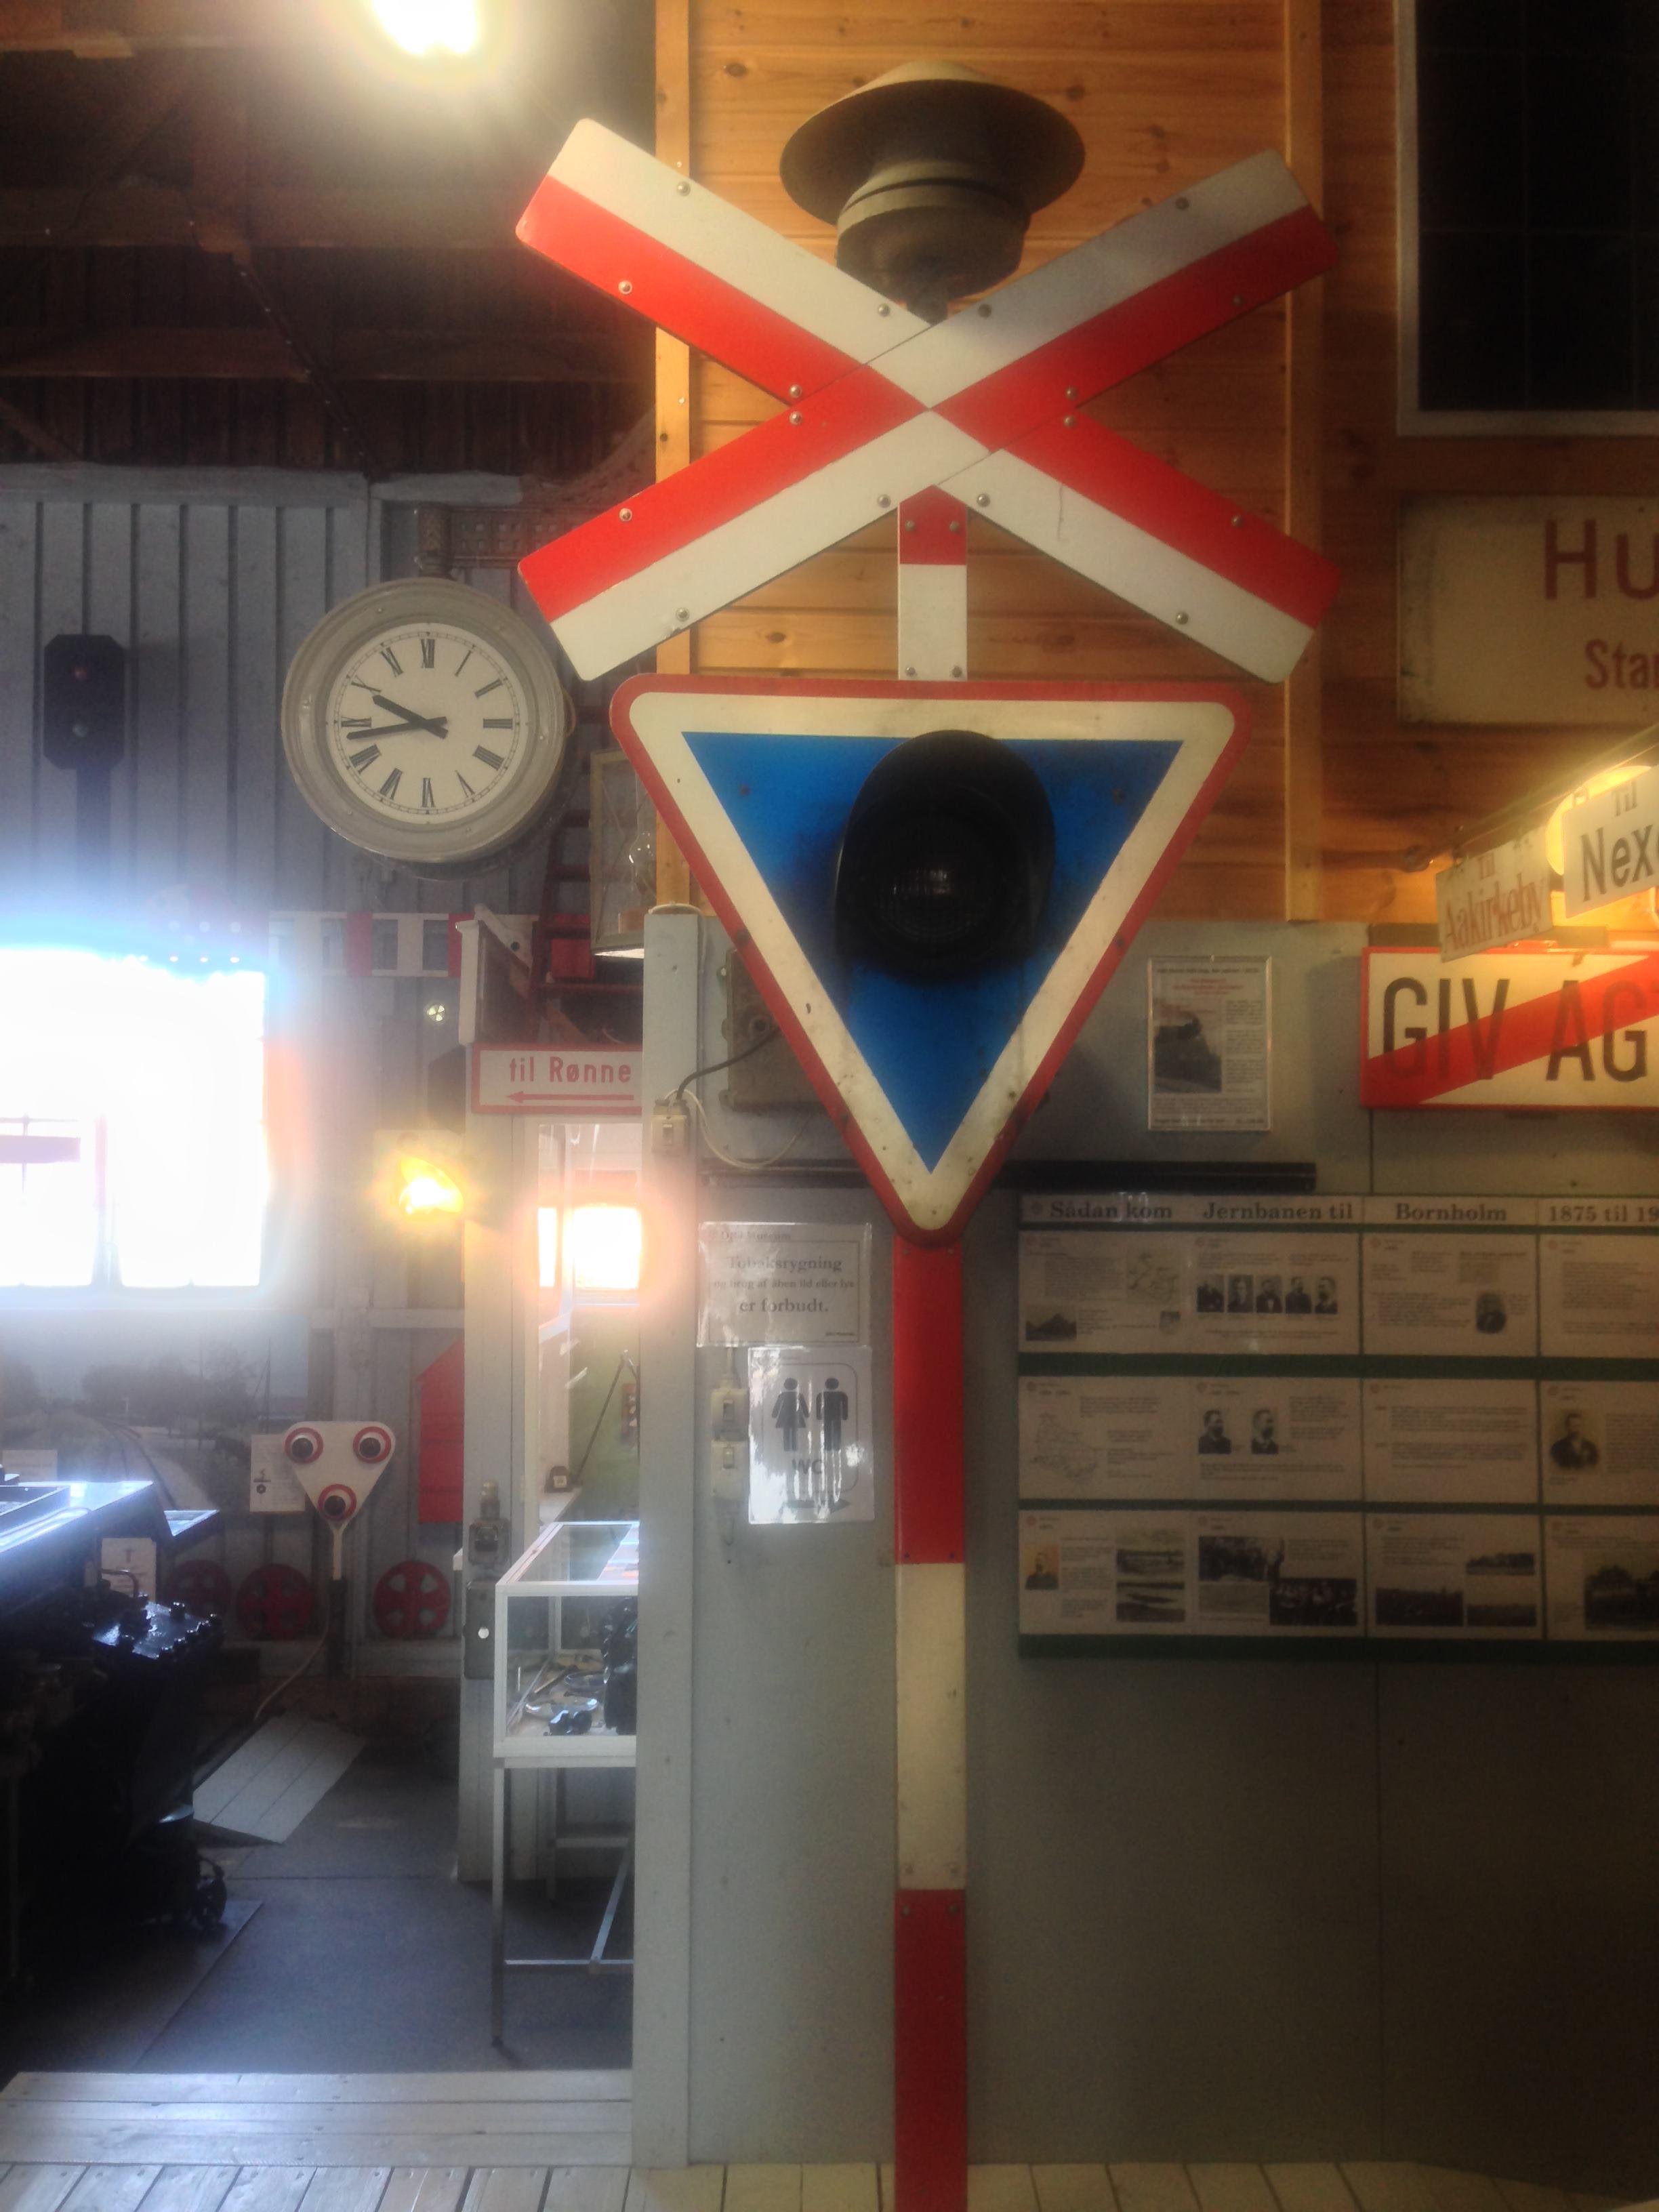 Signalanlage im Eisenbahnmuseum Nexø